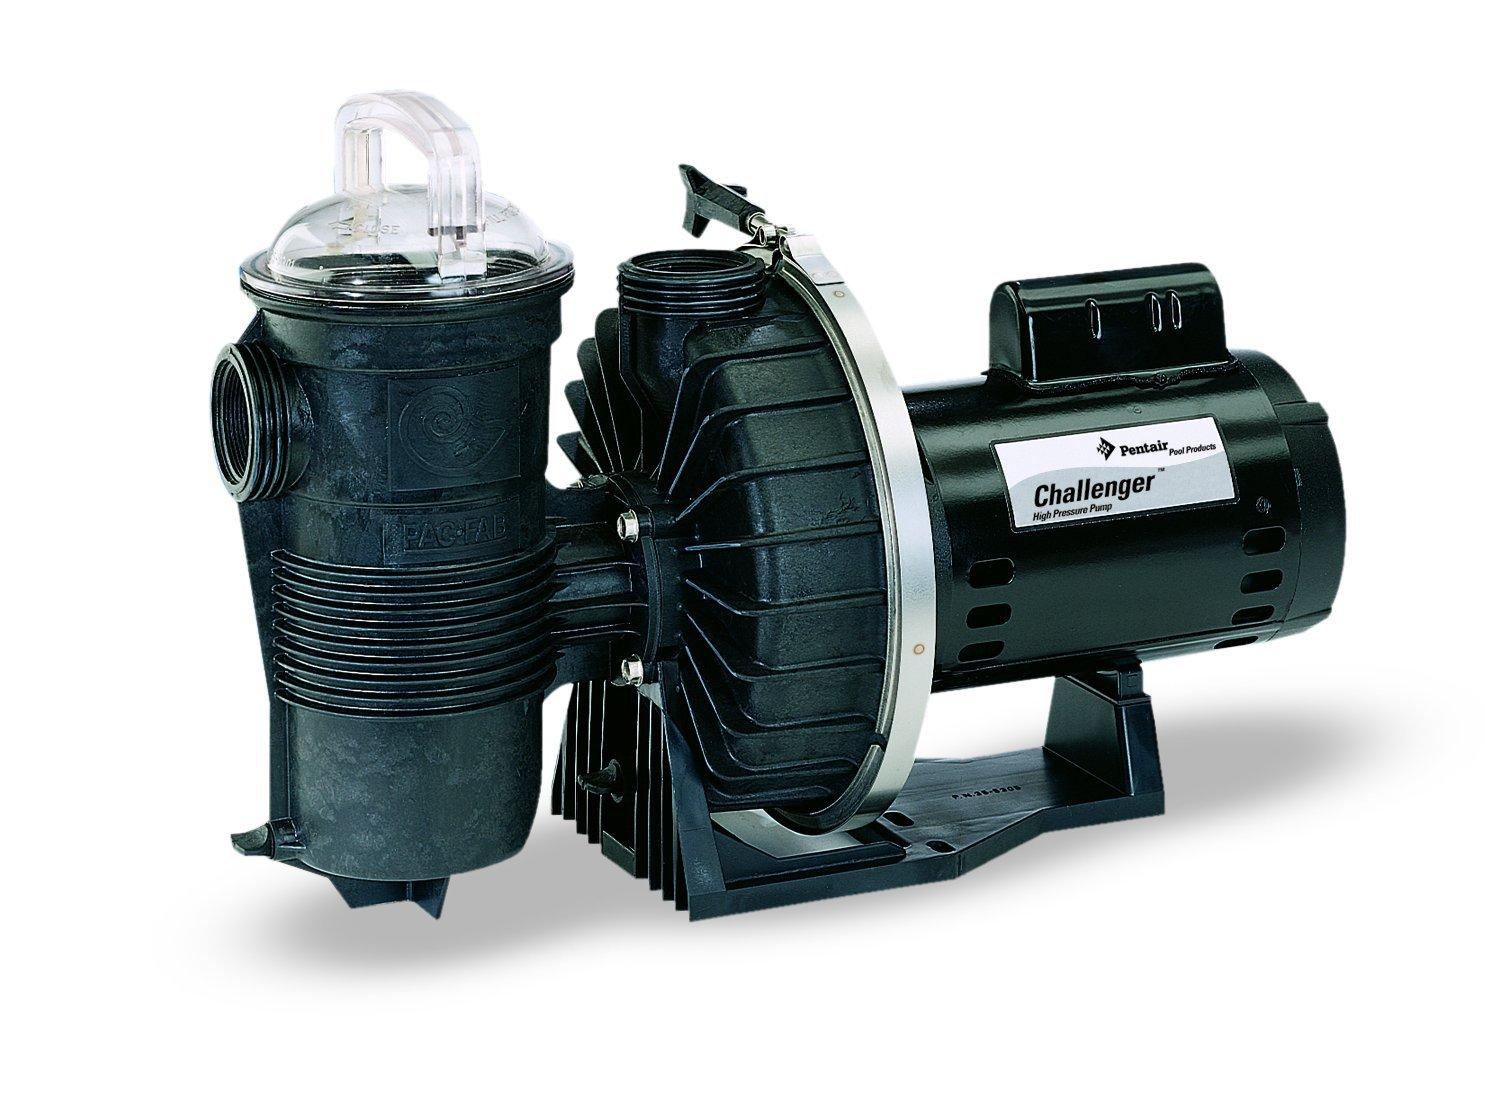 Pentair 346201 Challenger High Pressure Pump Single Speed 2-Horsepower Up  Rated Black